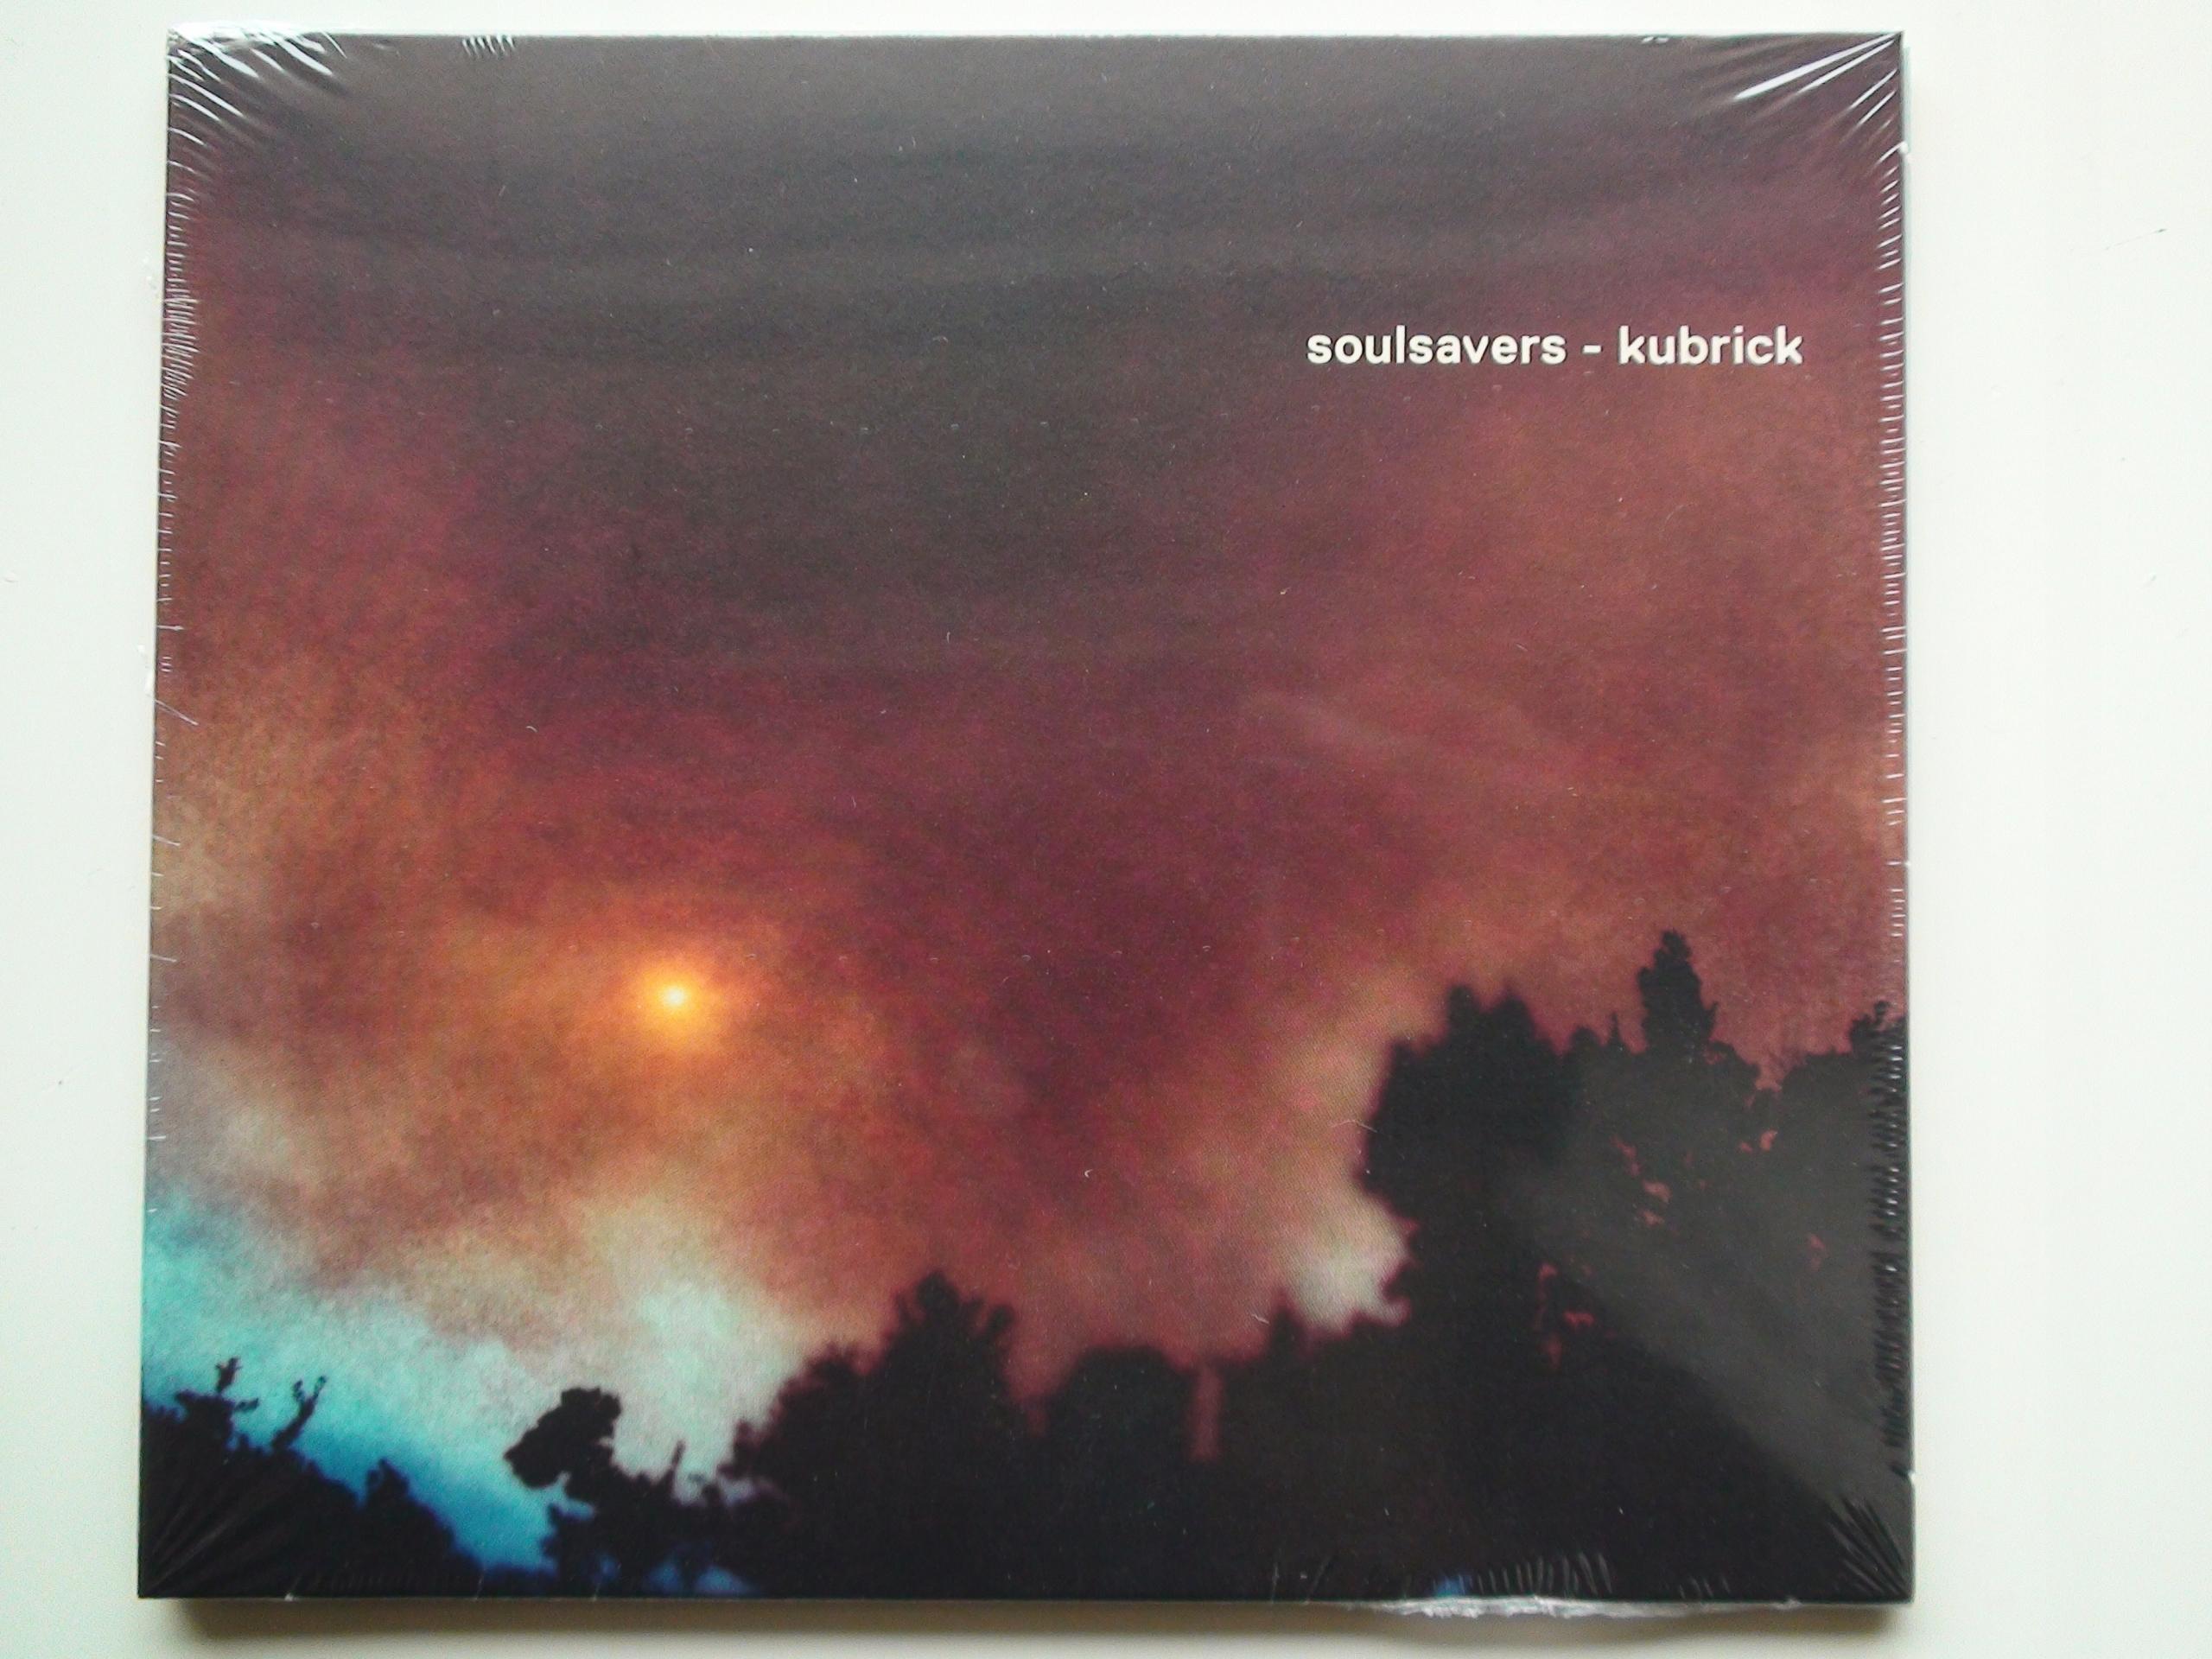 SOULSAVERS - Kubrick (folia) 2015r